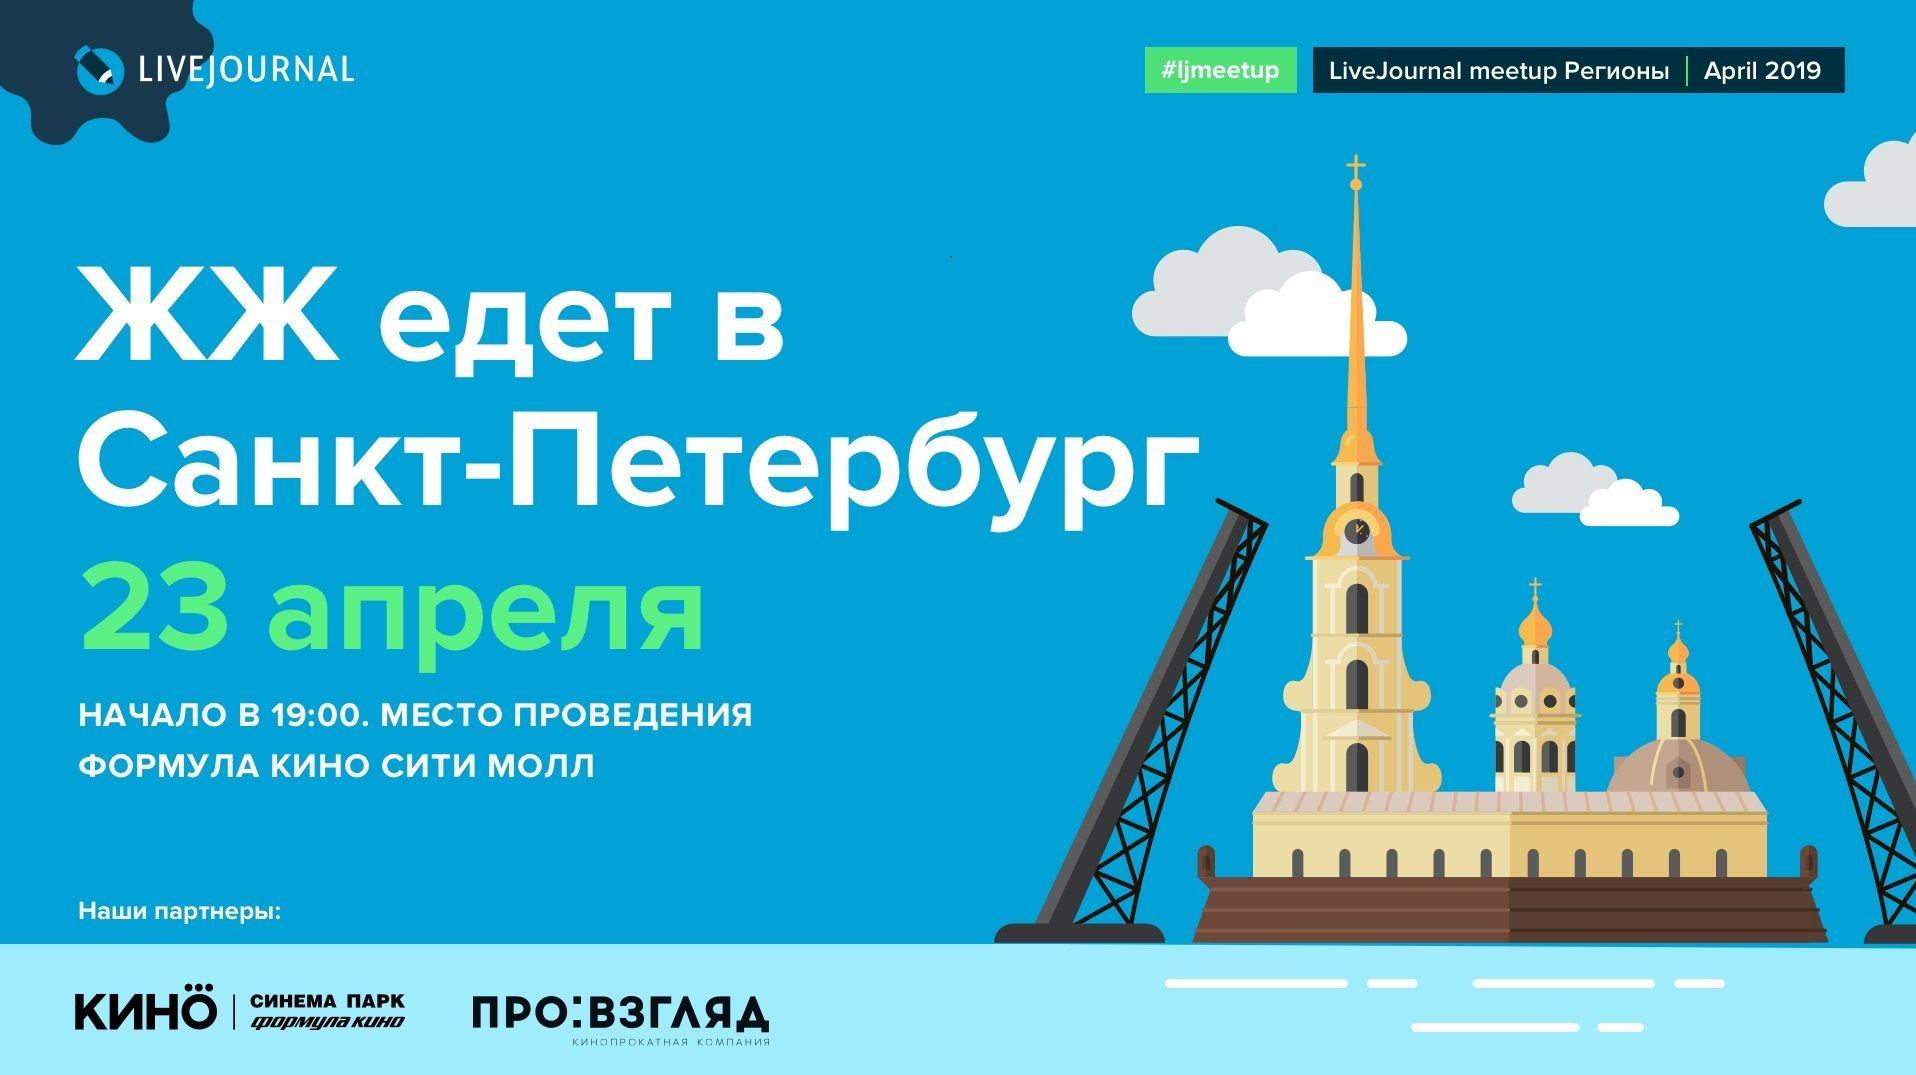 LiveJournal Meetup 23 апреля в Санкт-Петербурге